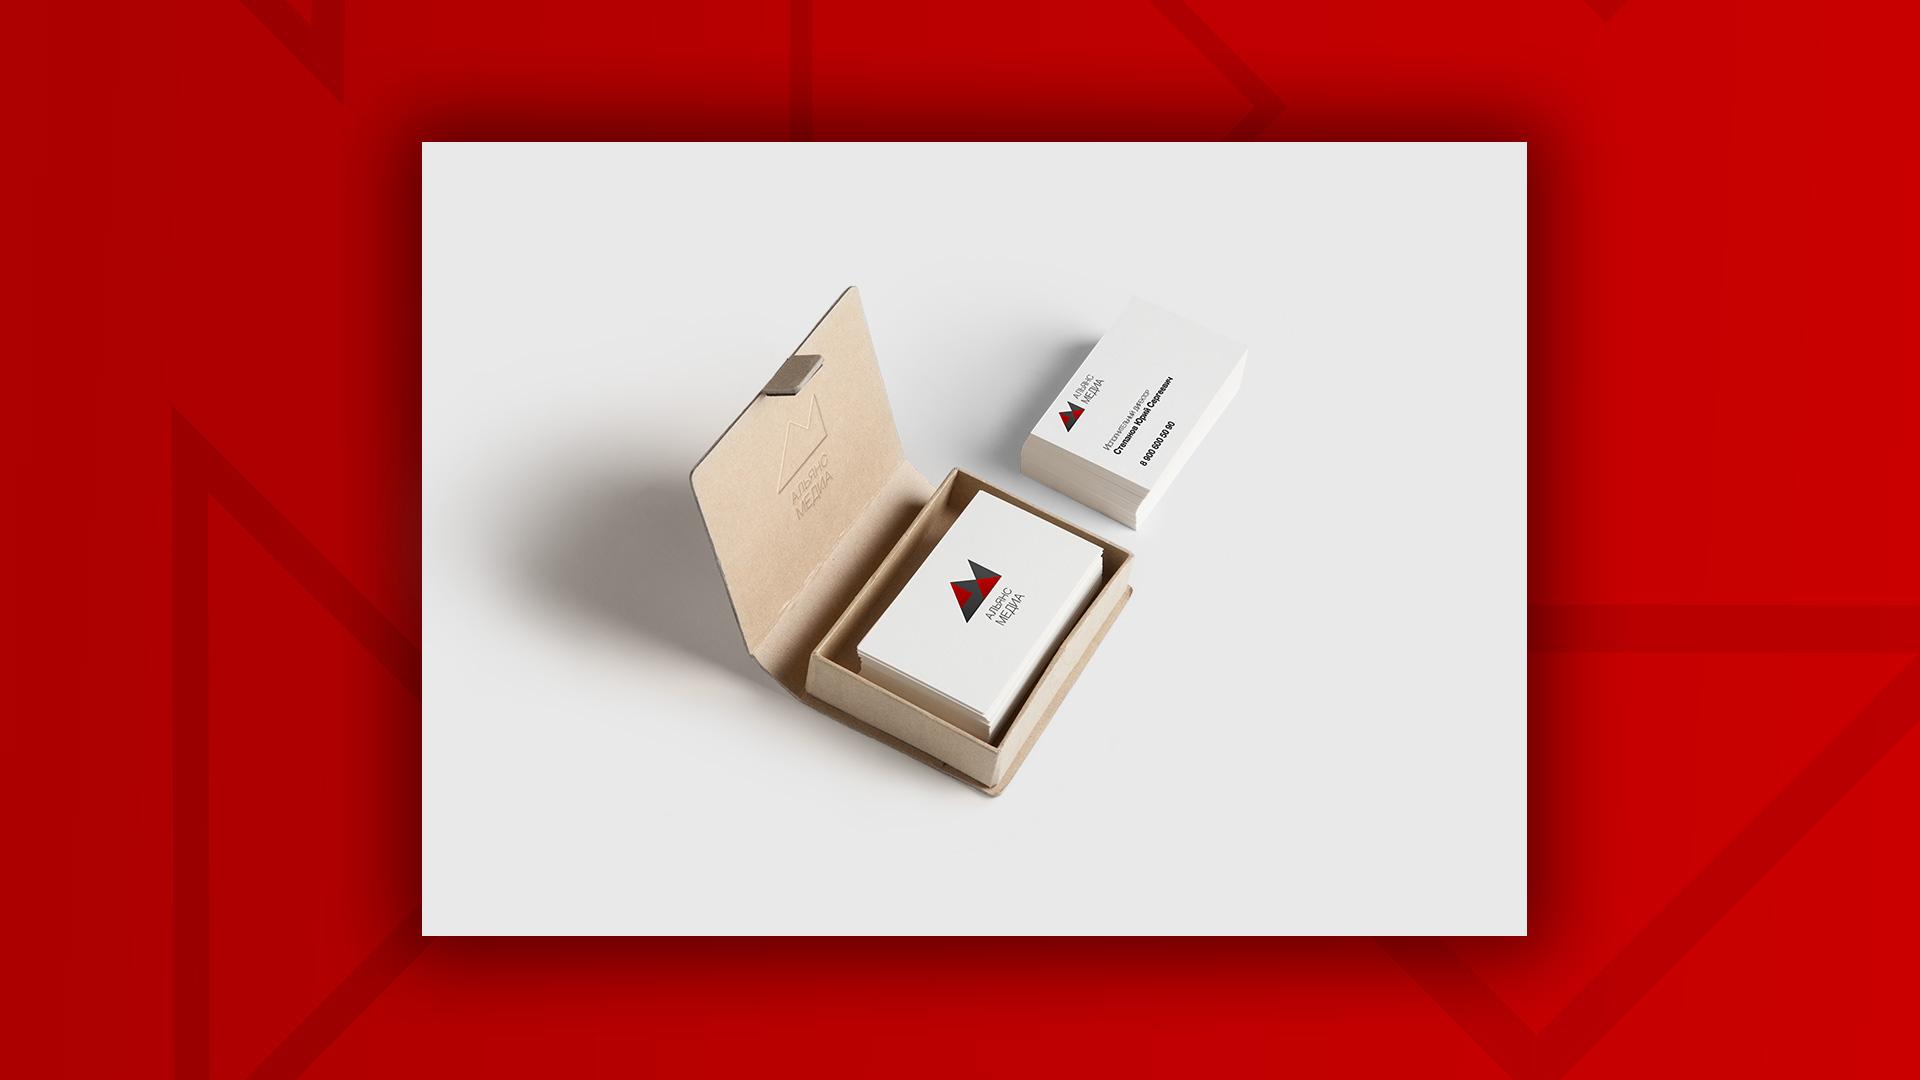 Создать логотип для компании фото f_3755ab14dc86ae6a.jpg